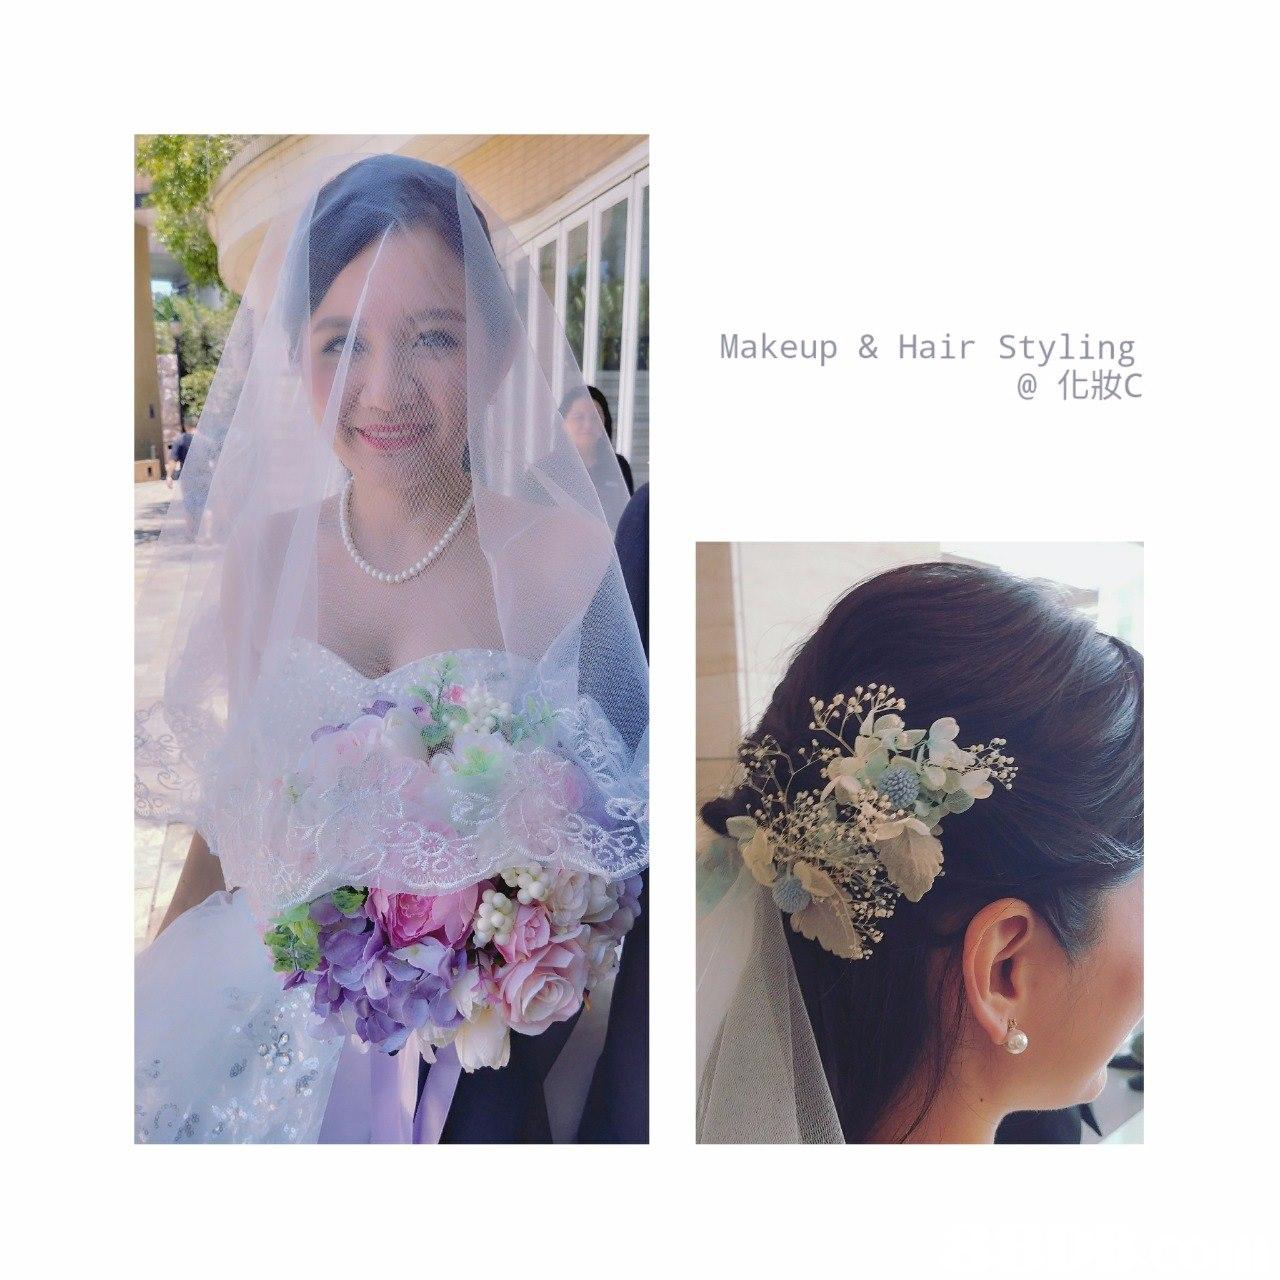 Makeup & Hair Styling @化妝c,flower,hair,bride,headpiece,hair accessory